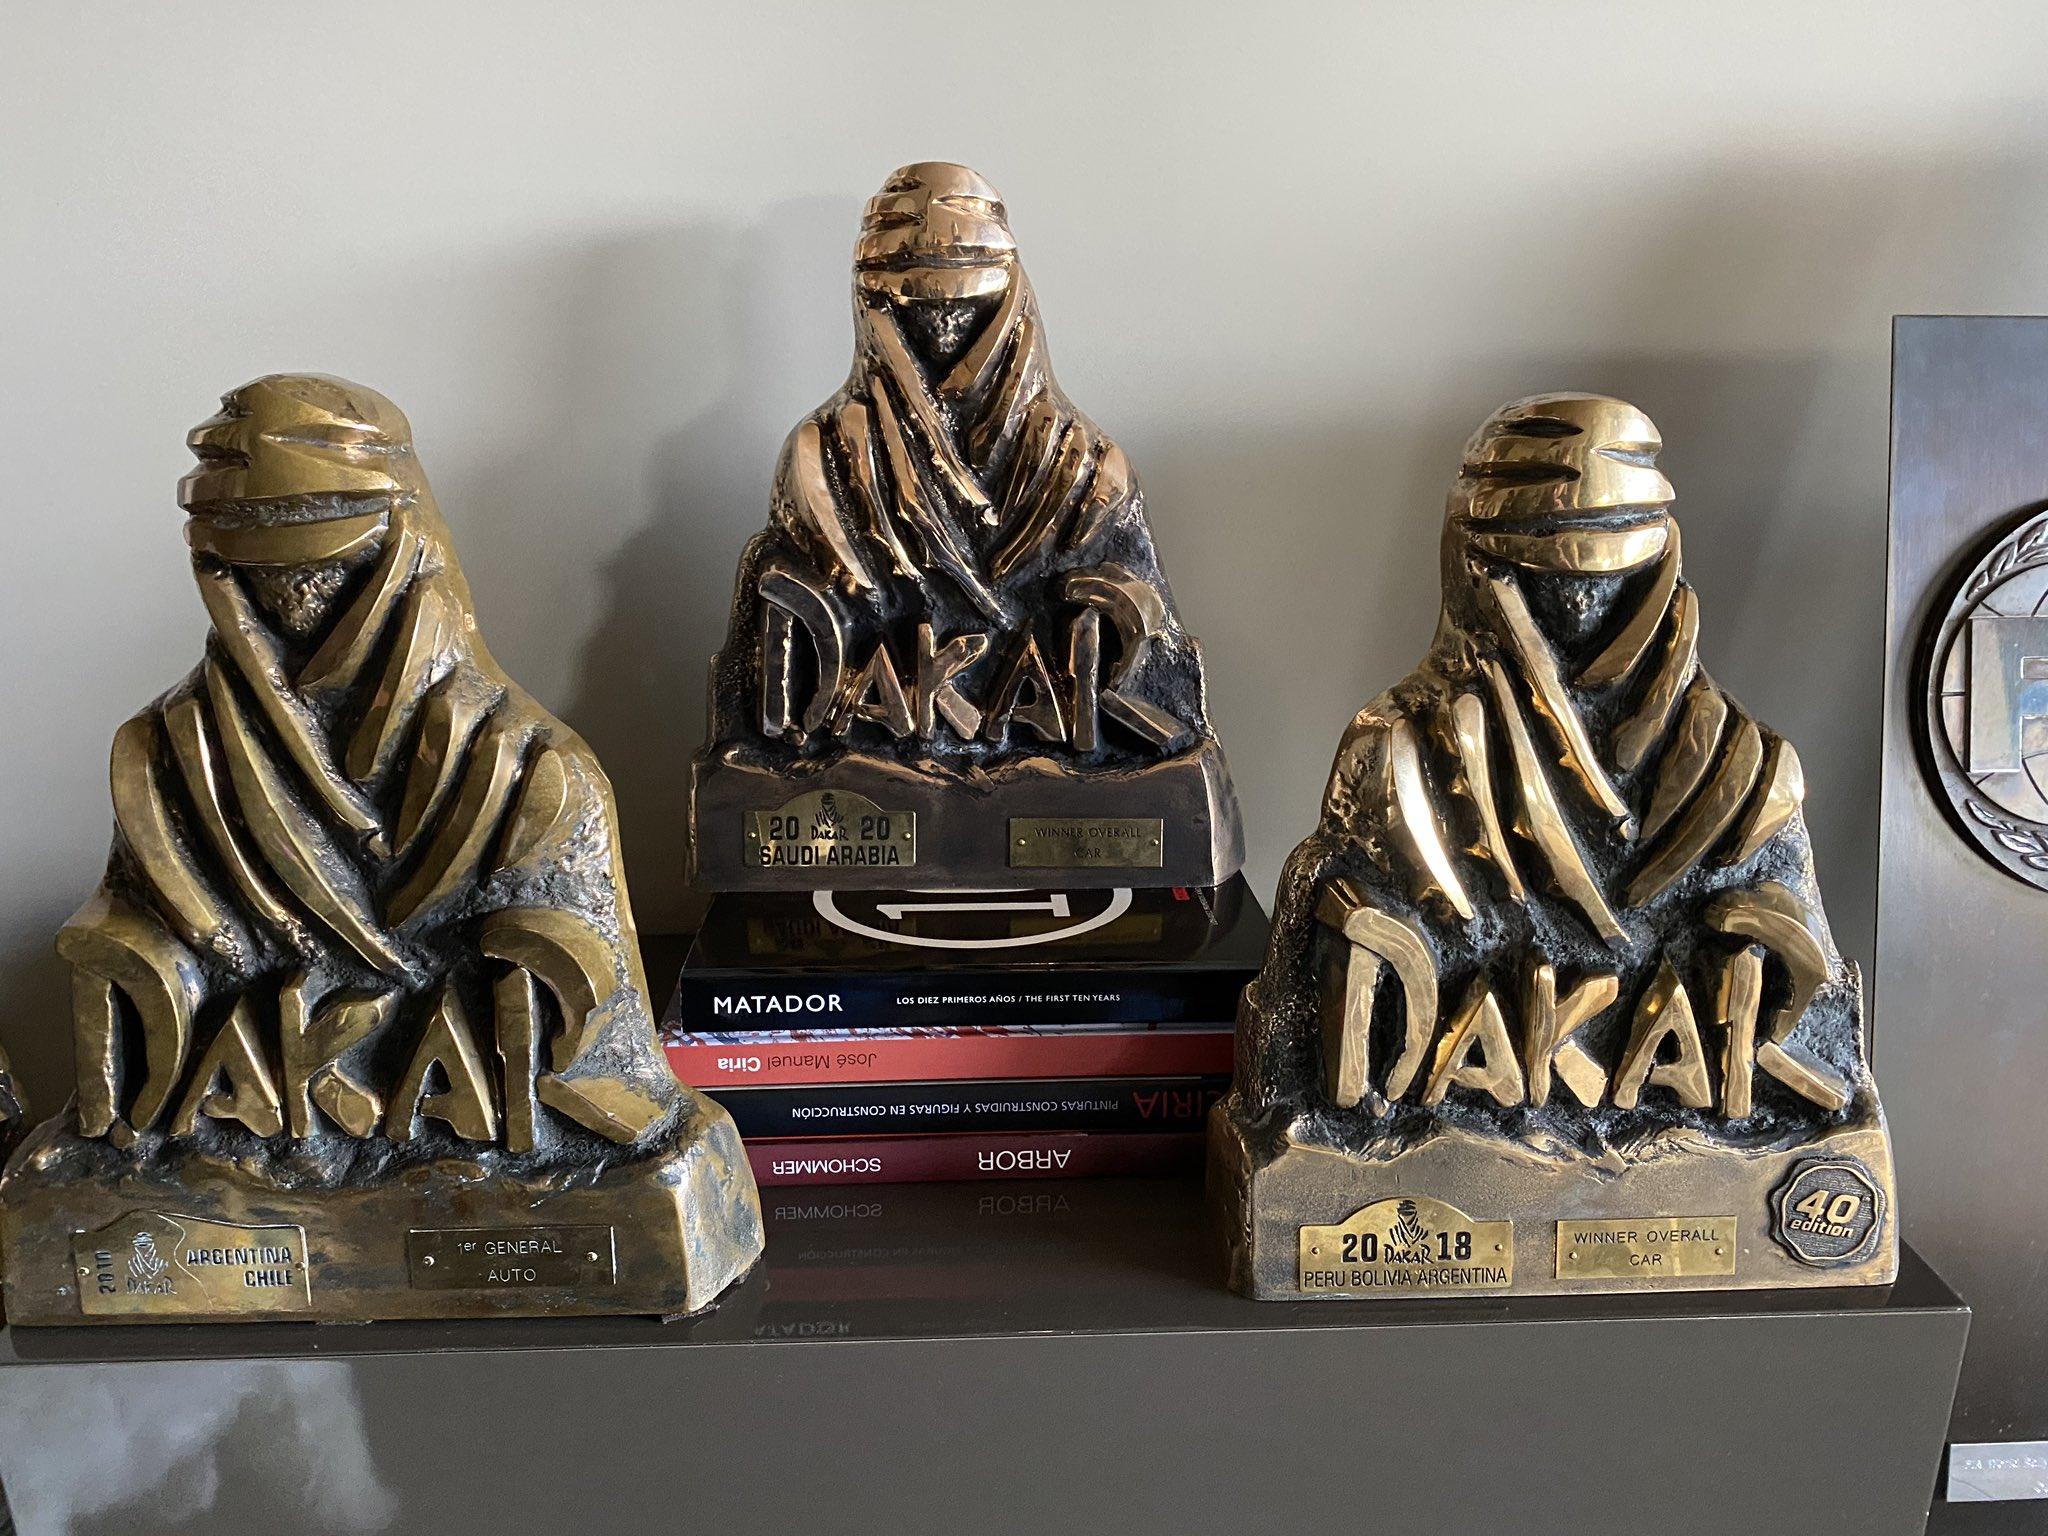 2020 42º Rallye Raid Dakar - Arabia Saudí [5-17 Enero] - Página 12 EOpwHI9WsAIUozO?format=jpg&name=4096x4096